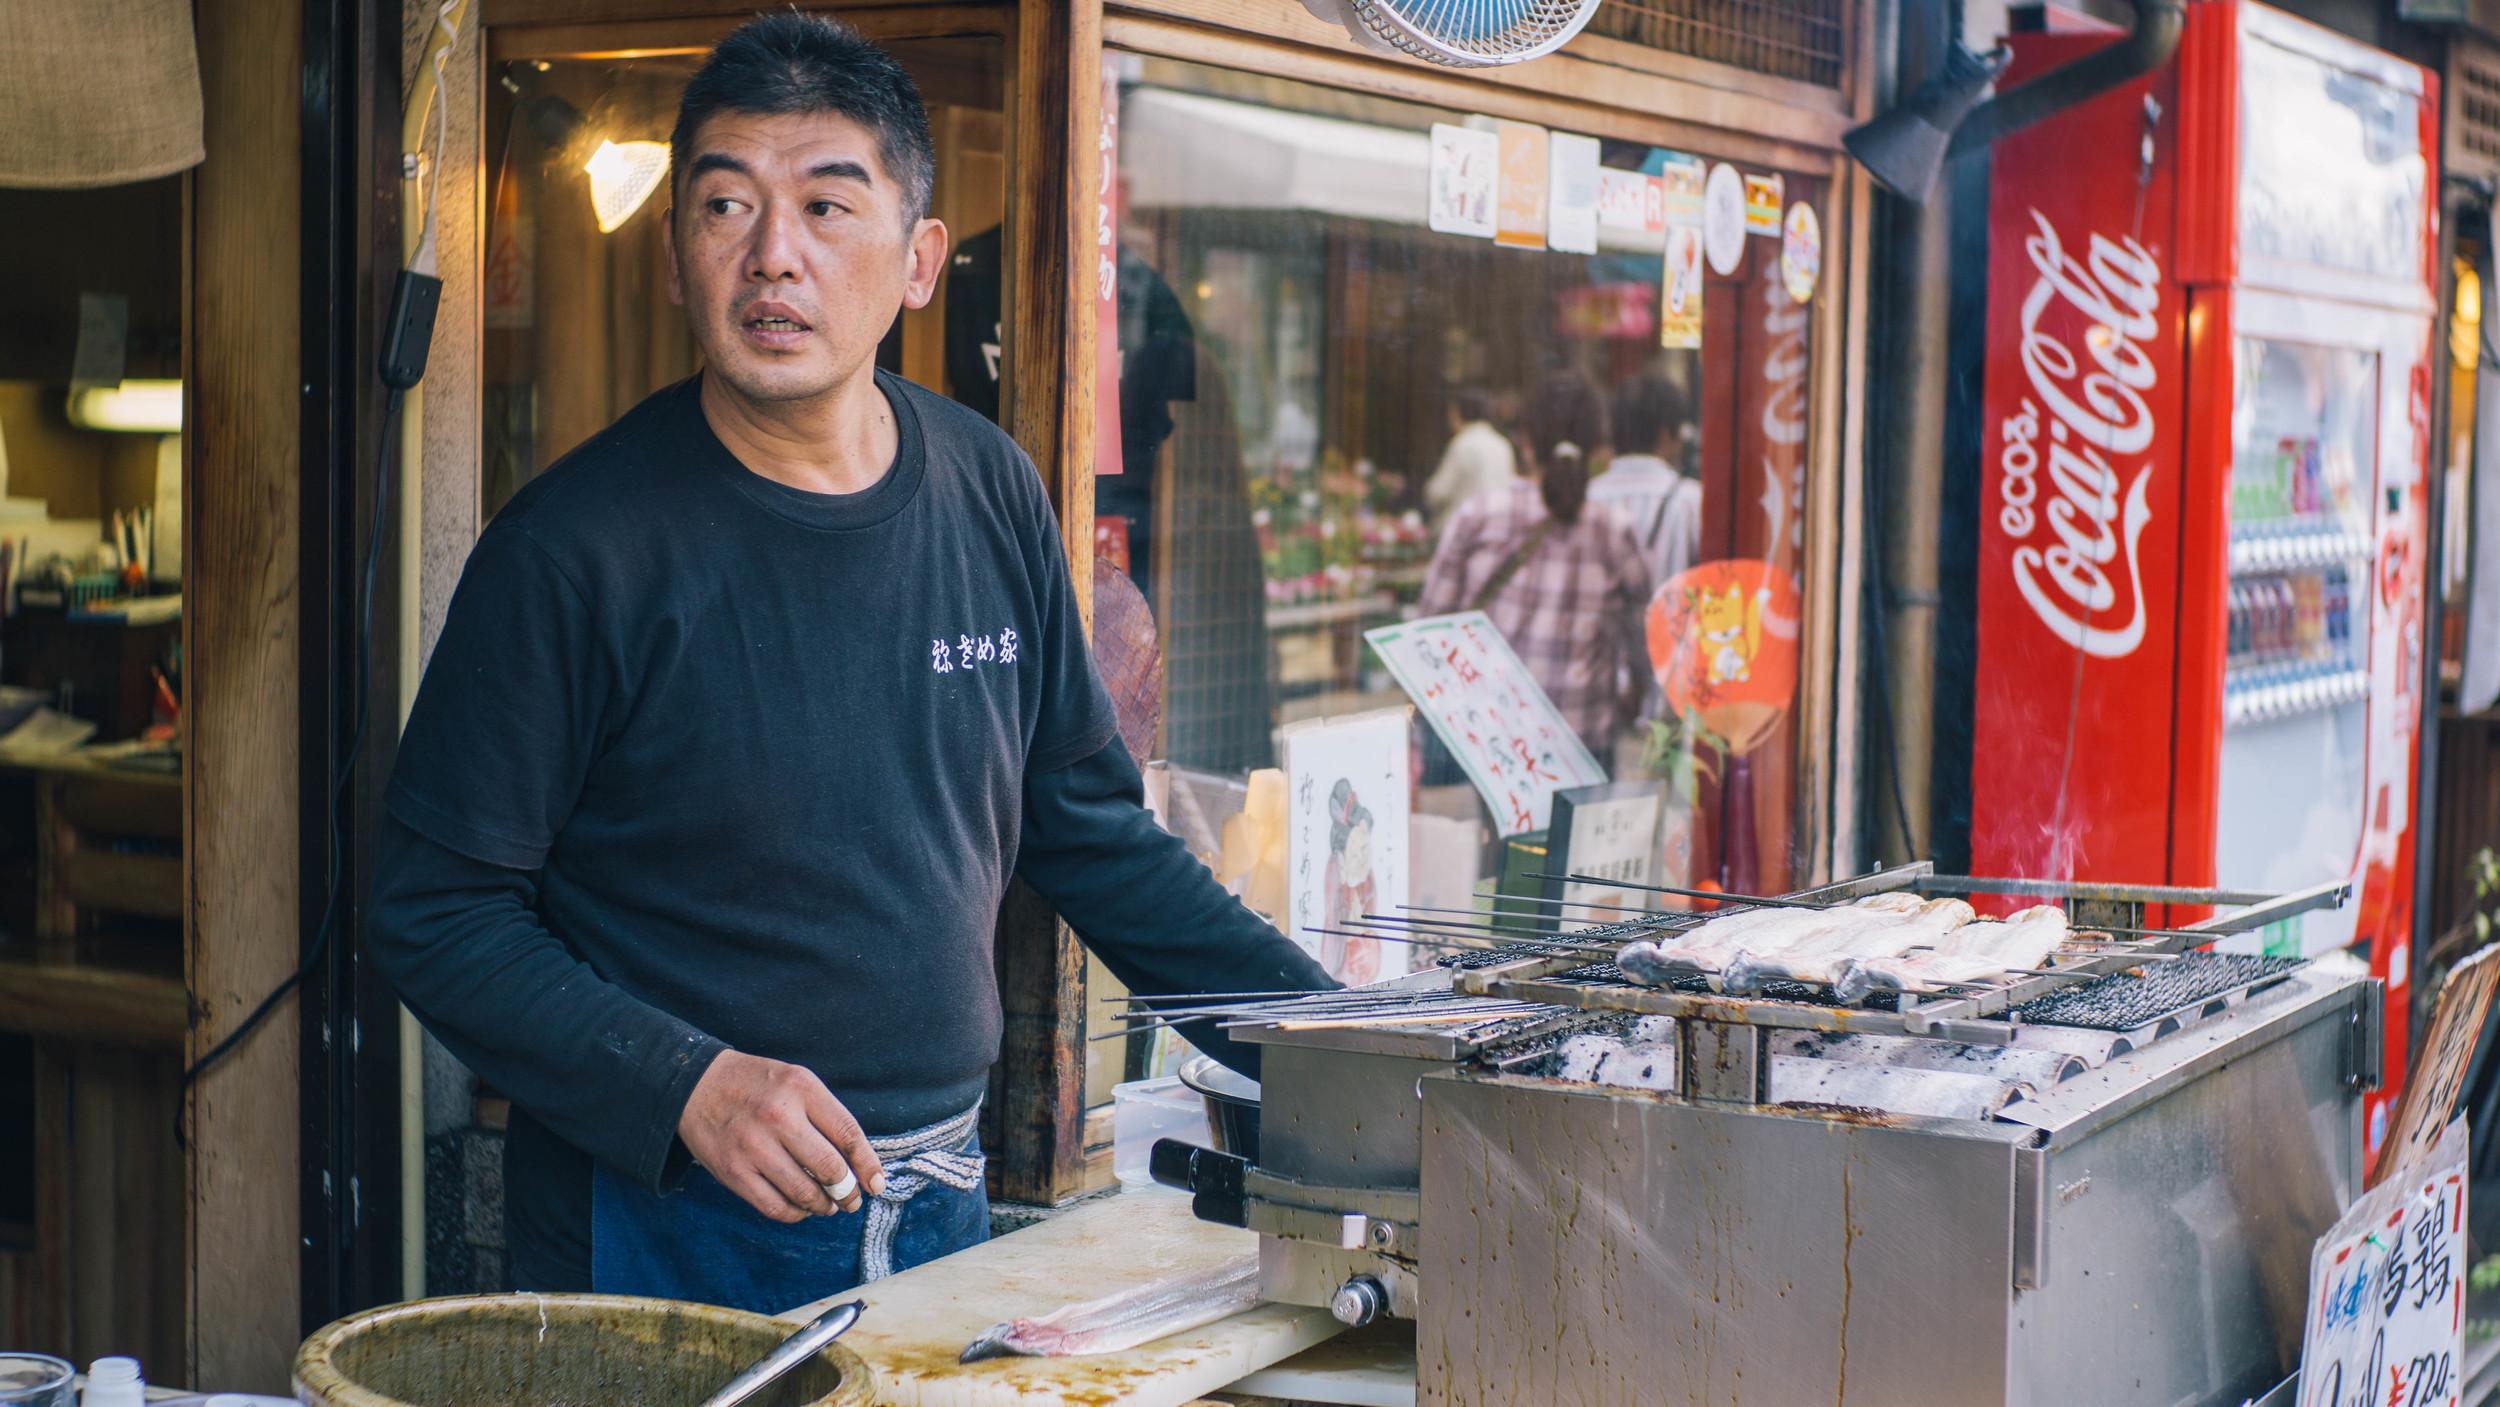 At the entrance to Fushimi Inari-taisha. Grilled unagi (and other street vendors) everywhere!